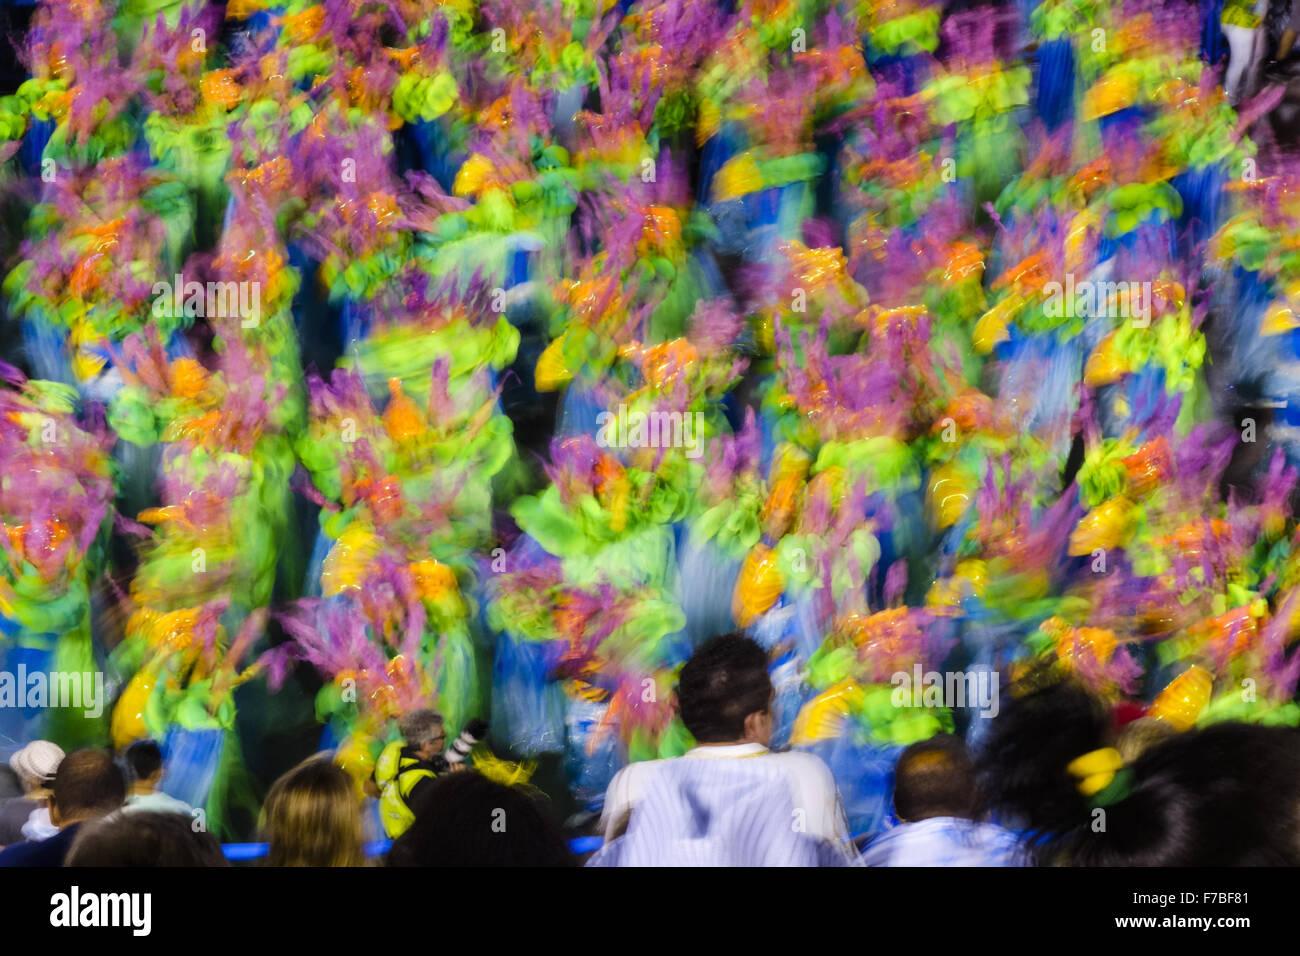 Rio de Janeiro, carnival, Sambadromo, Brazil - Stock Image